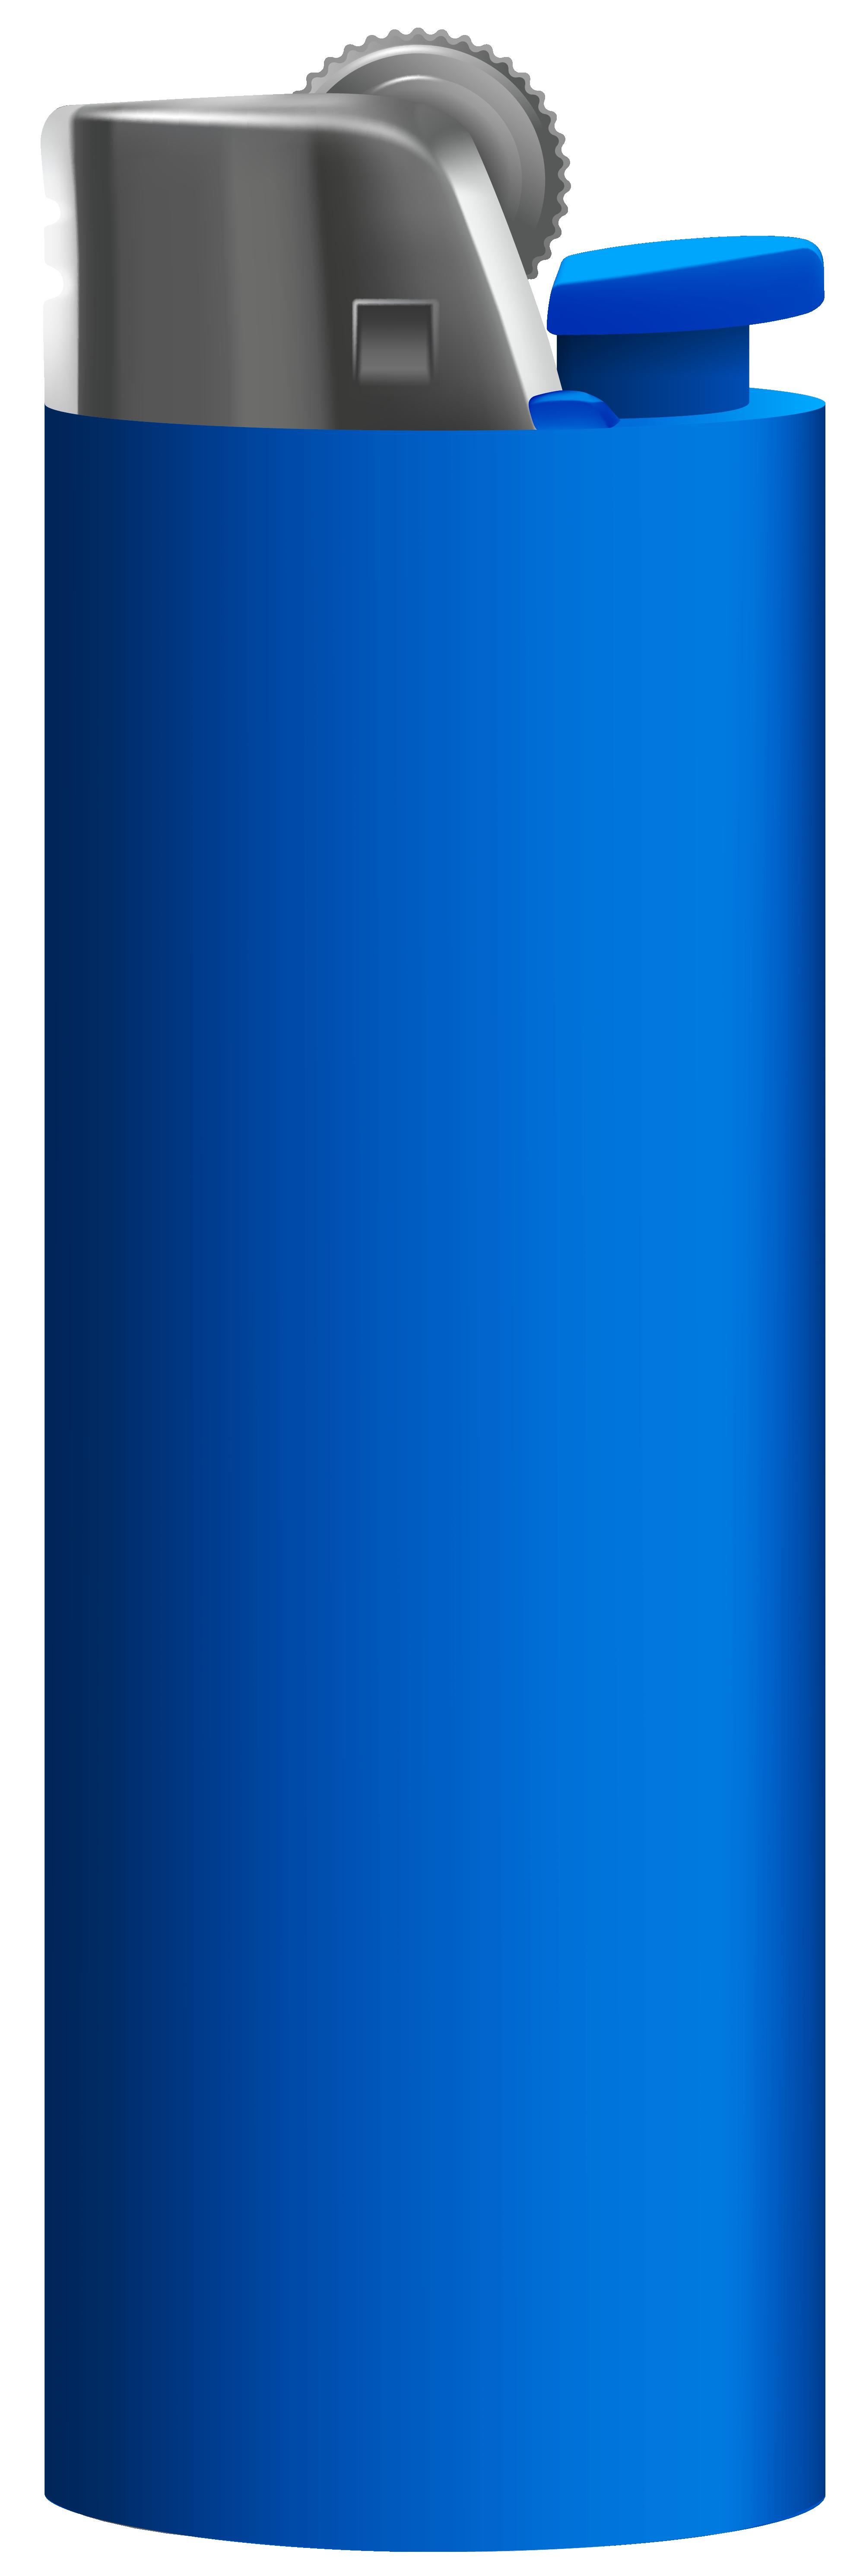 Blue Cigarette Lighter PNG Clipart.